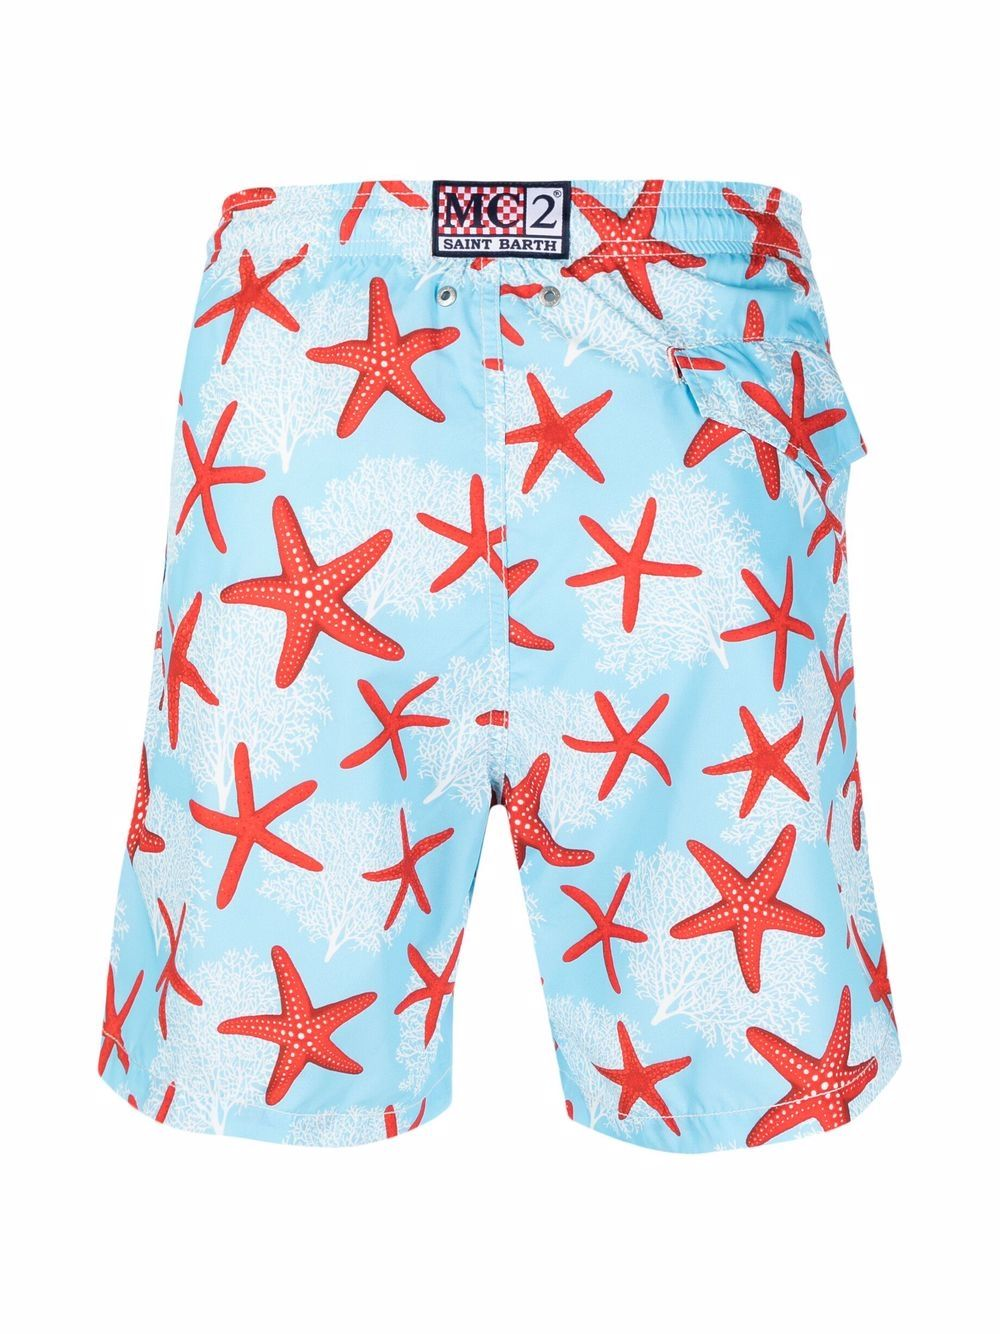 pantaloncini da bagno blu in poliestere riciclato MC2 | Costumi | LIGHTING-WONDERSEA31